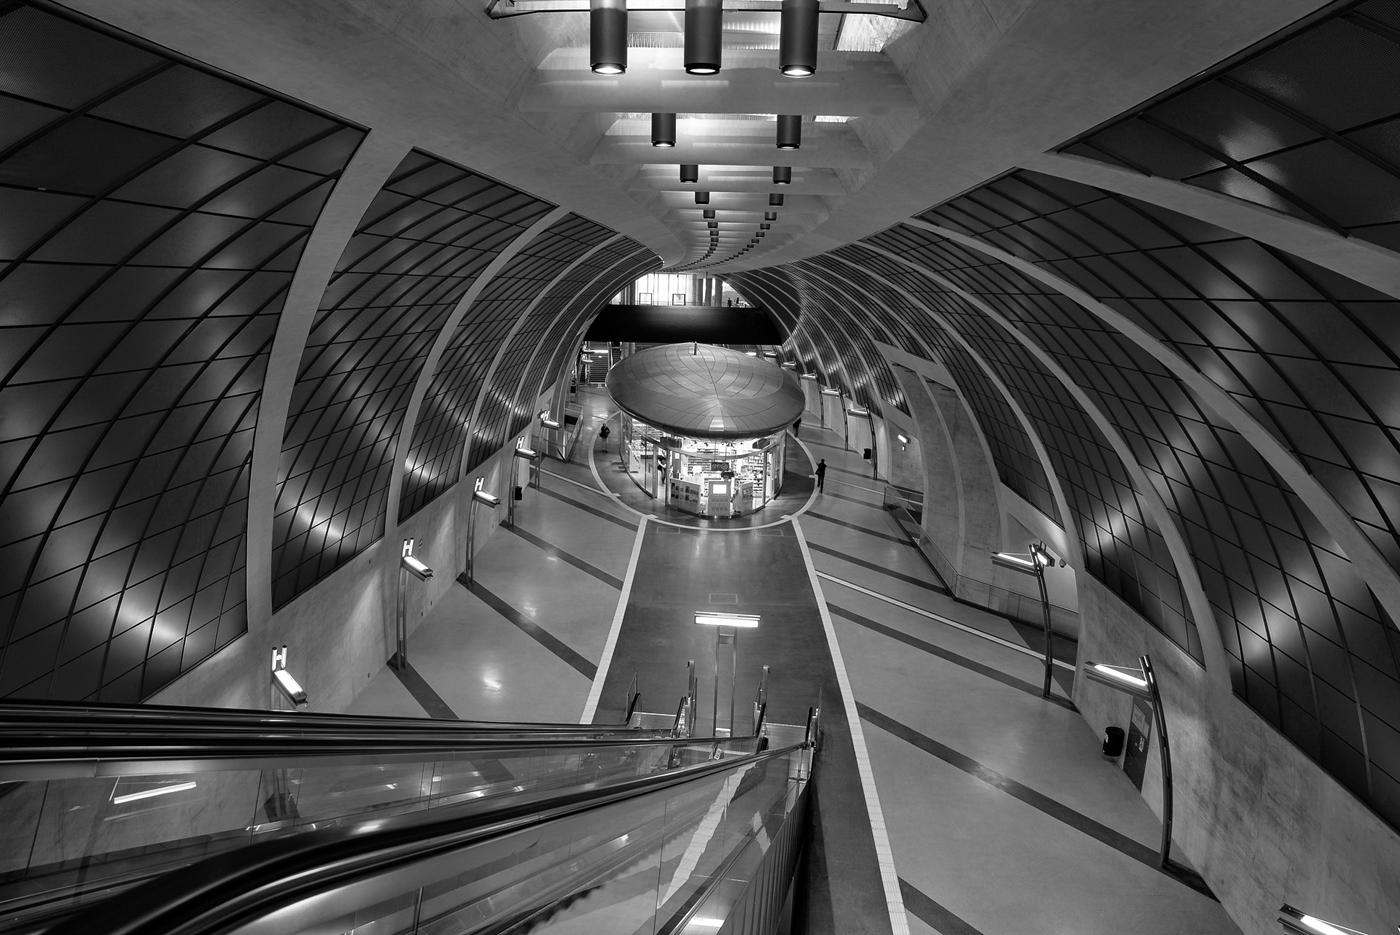 Urkunde: Bahnstation | © Achim Schüler